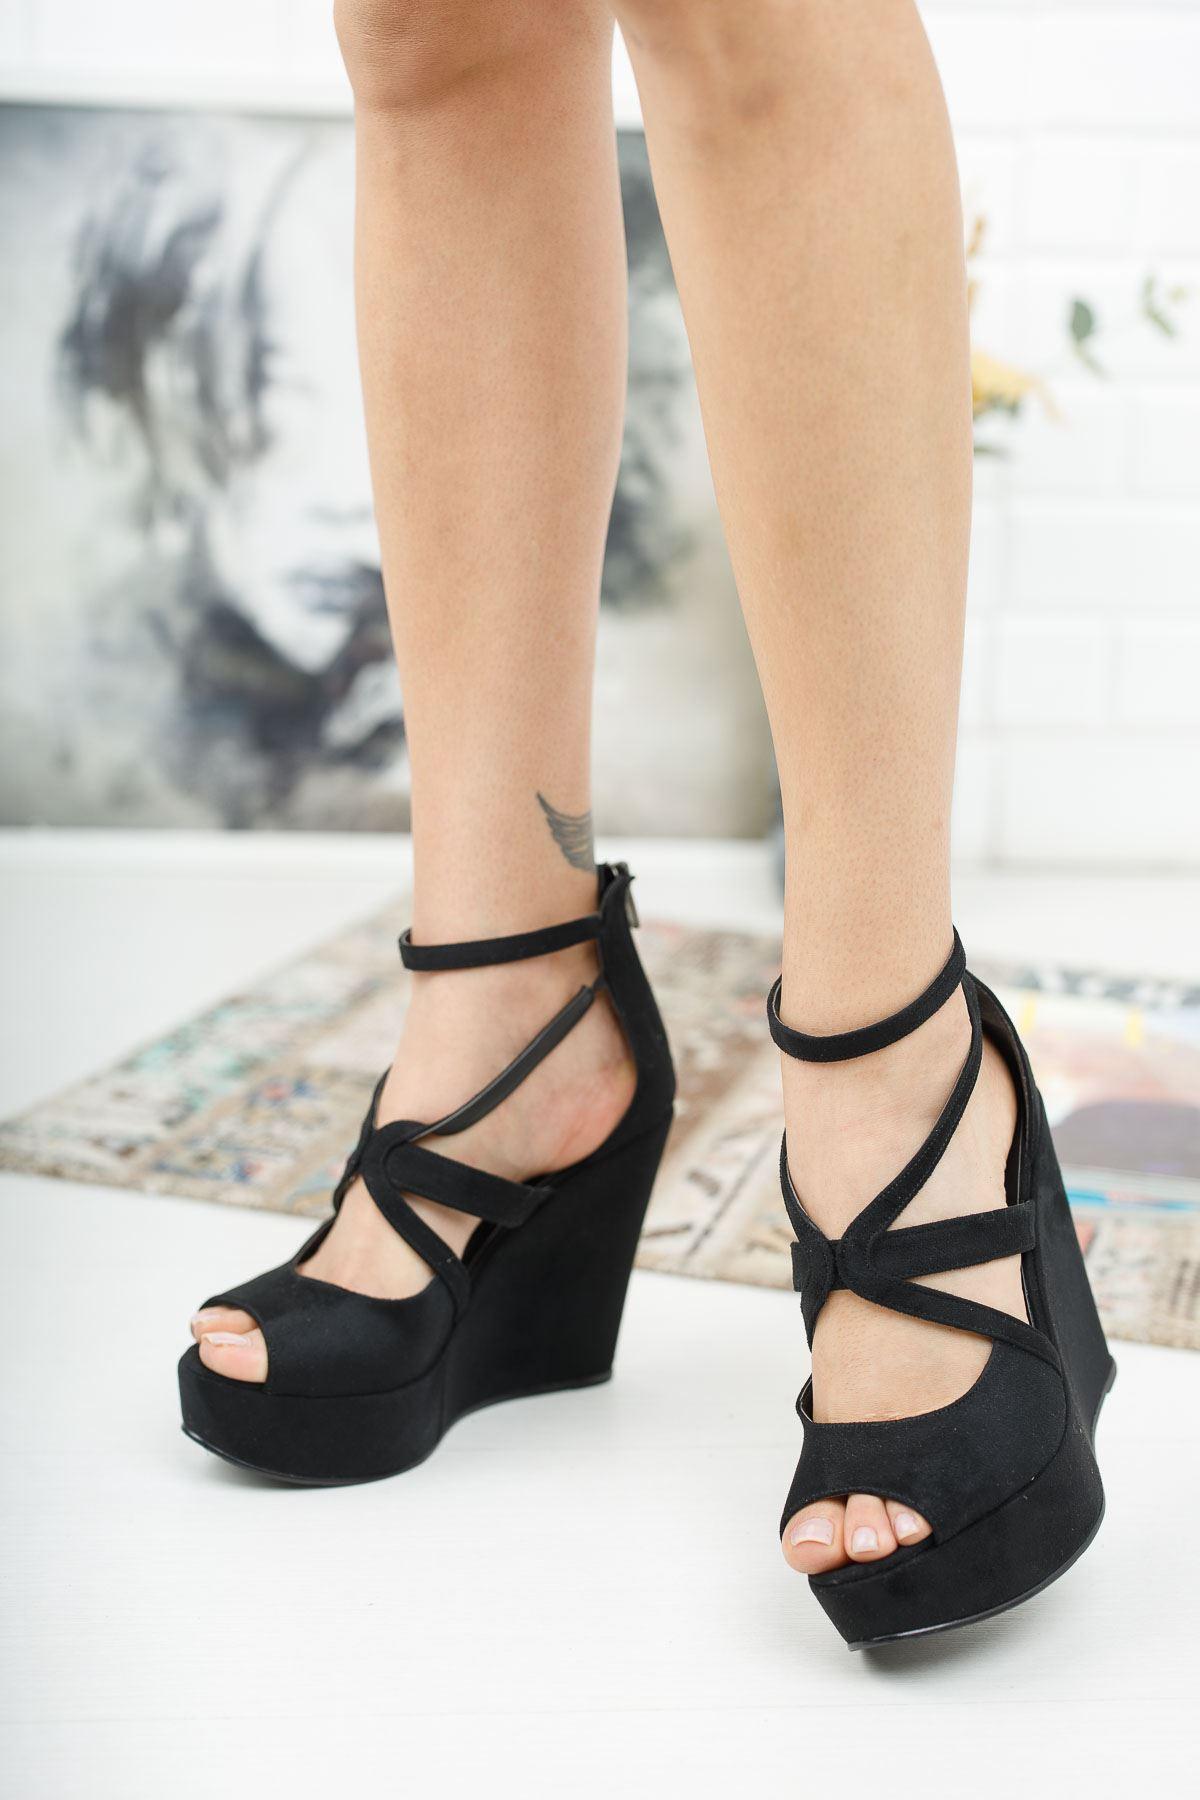 Parsil Siyah Süet Dolgu Topuklu Ayakkabı